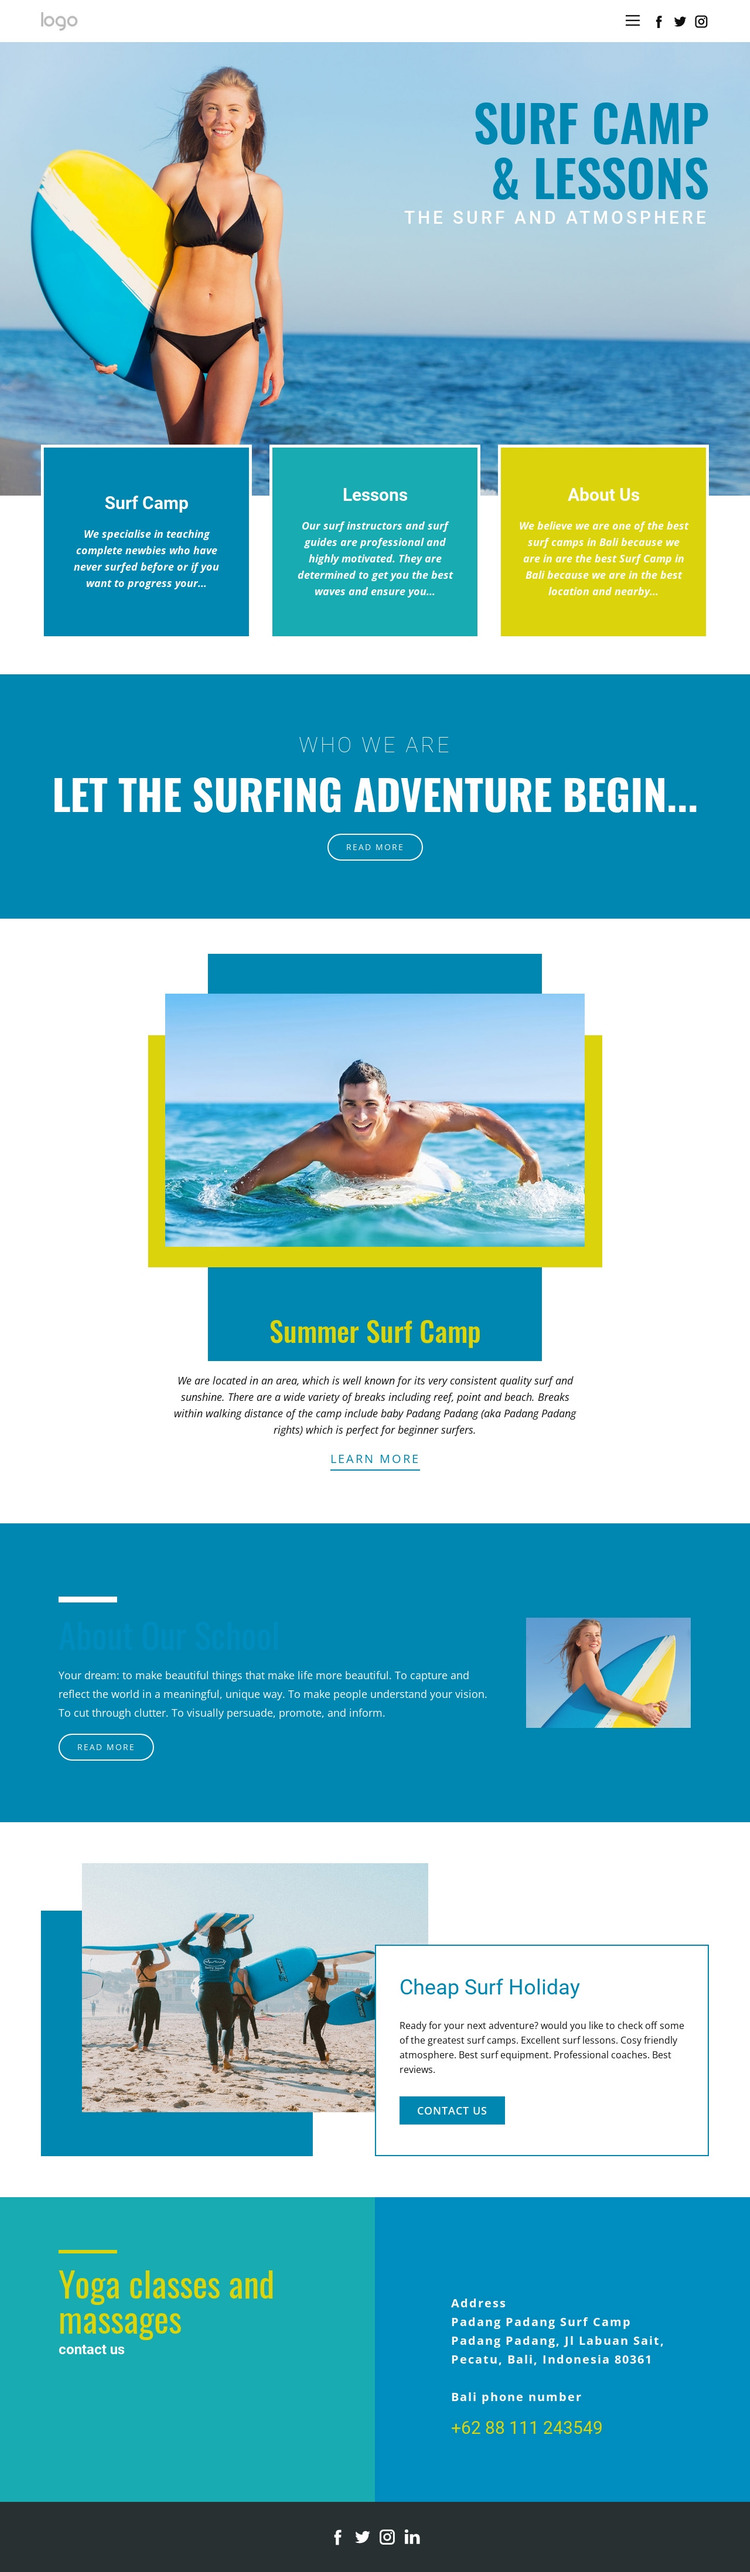 Camp for summer sports Web Design